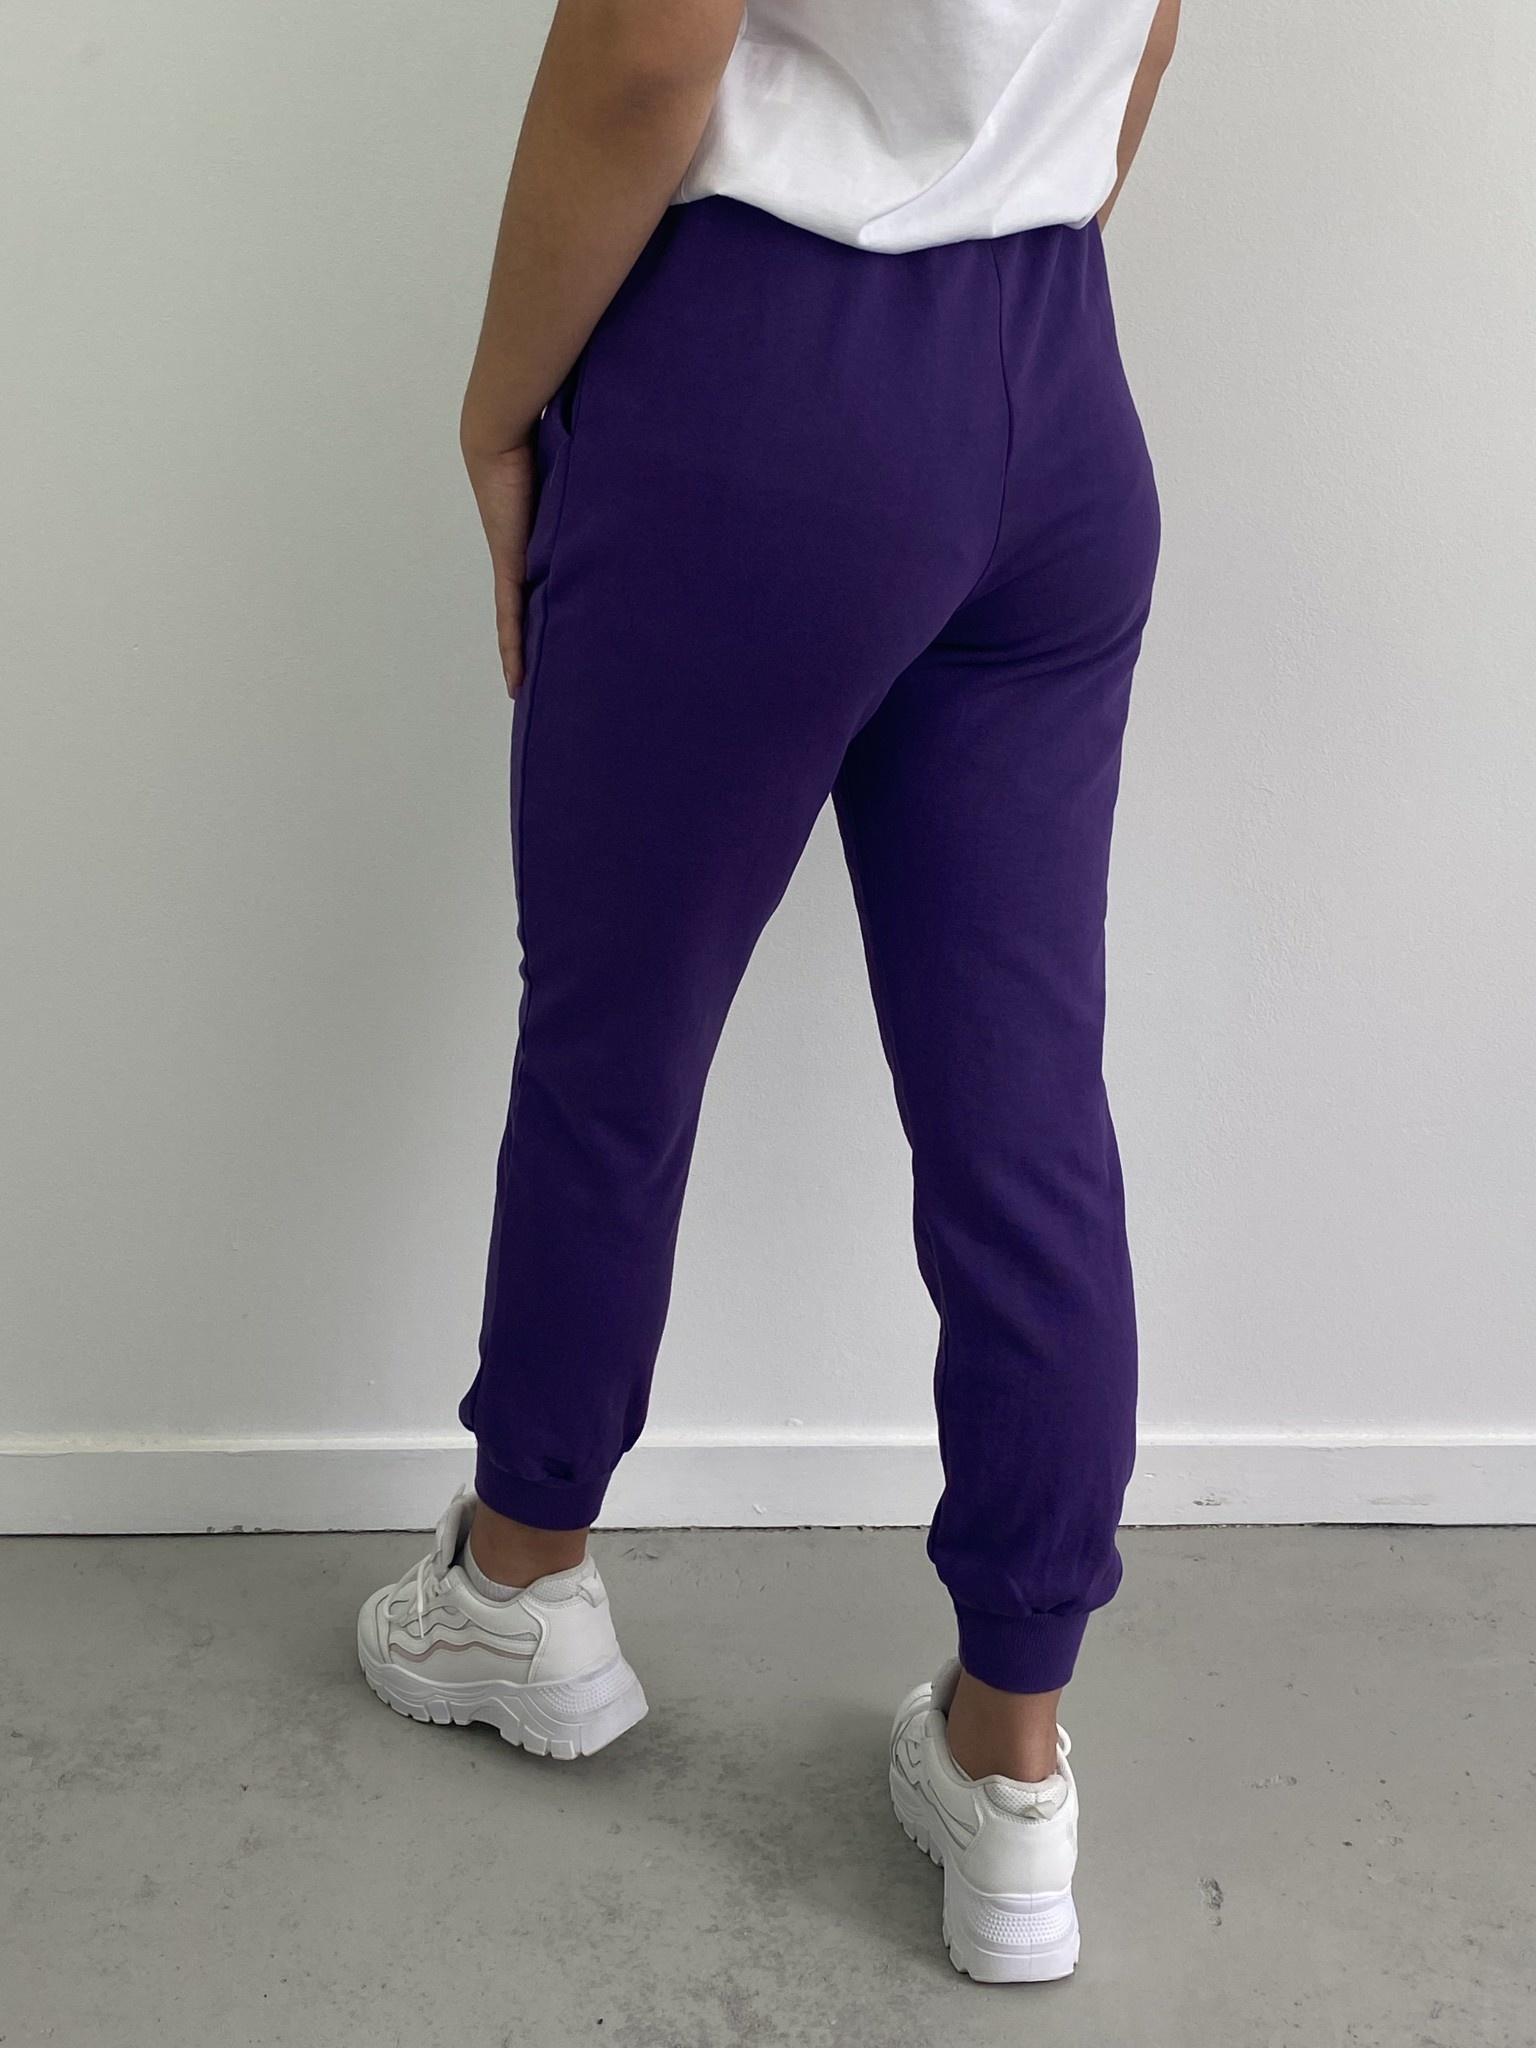 Sunki sweatpant Purple-4